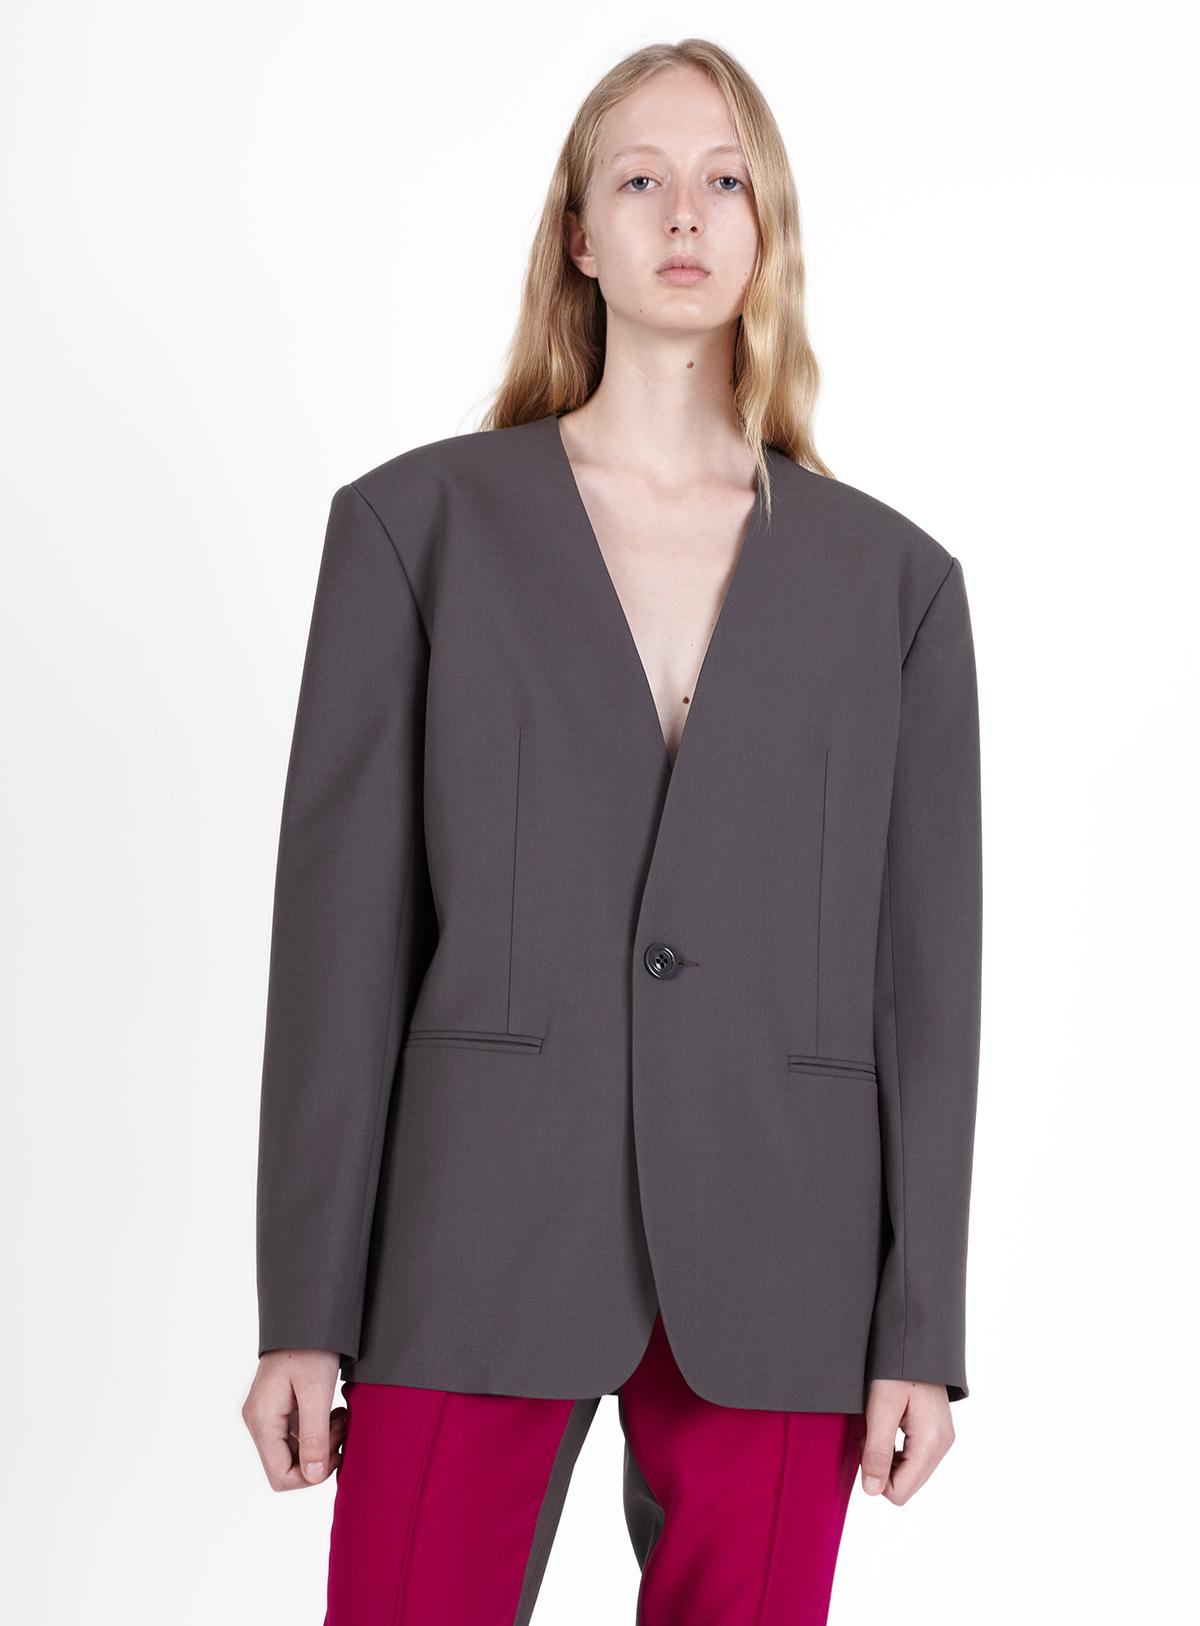 look-12 Blazer PERLA Trousers PALOMA